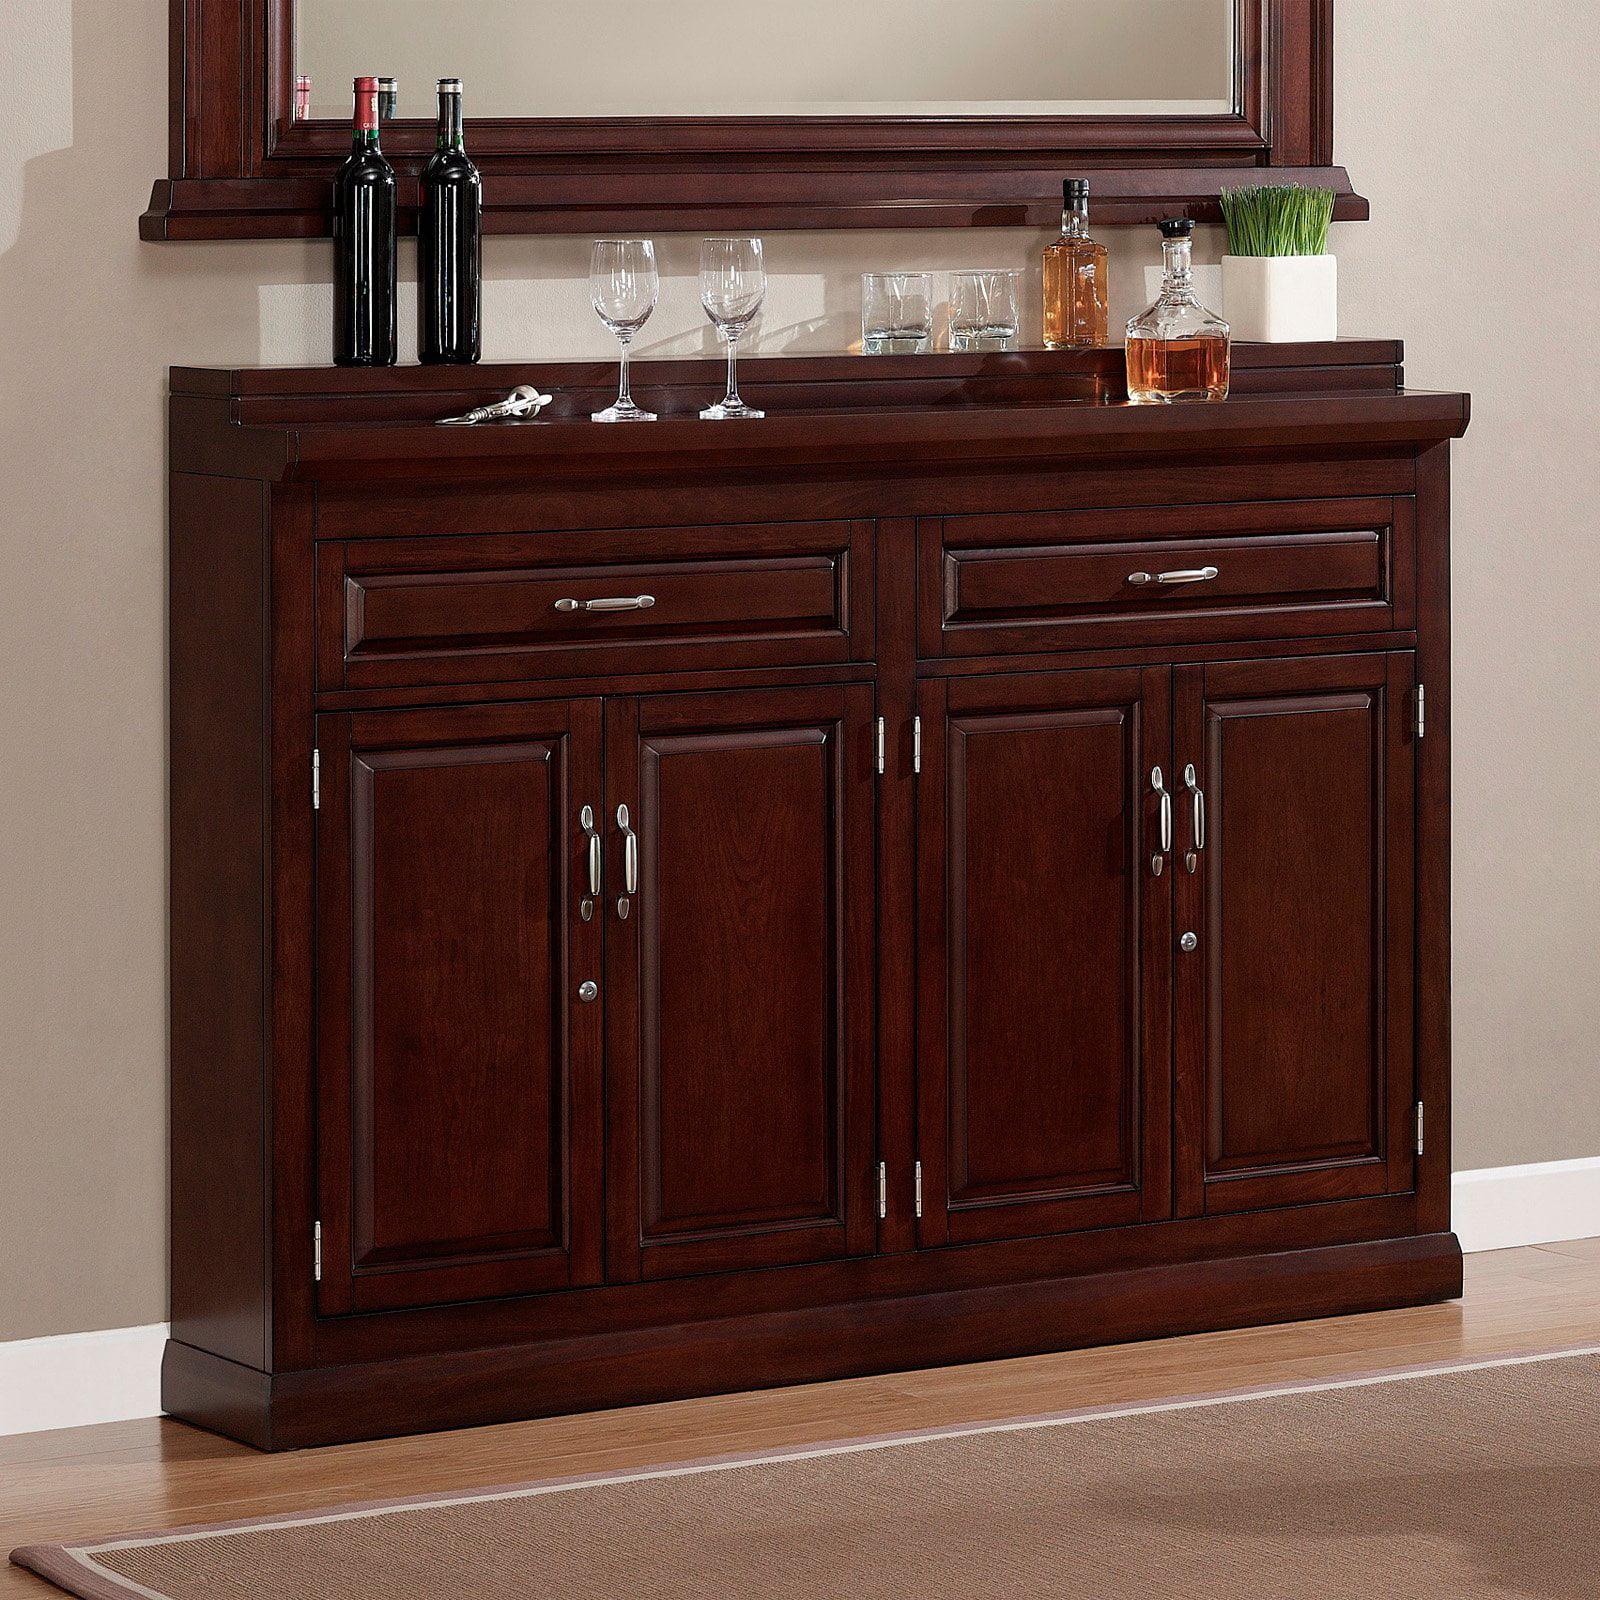 Beau AHB Ricardo Slimline Bar Cabinet   Cherry   Walmart.com